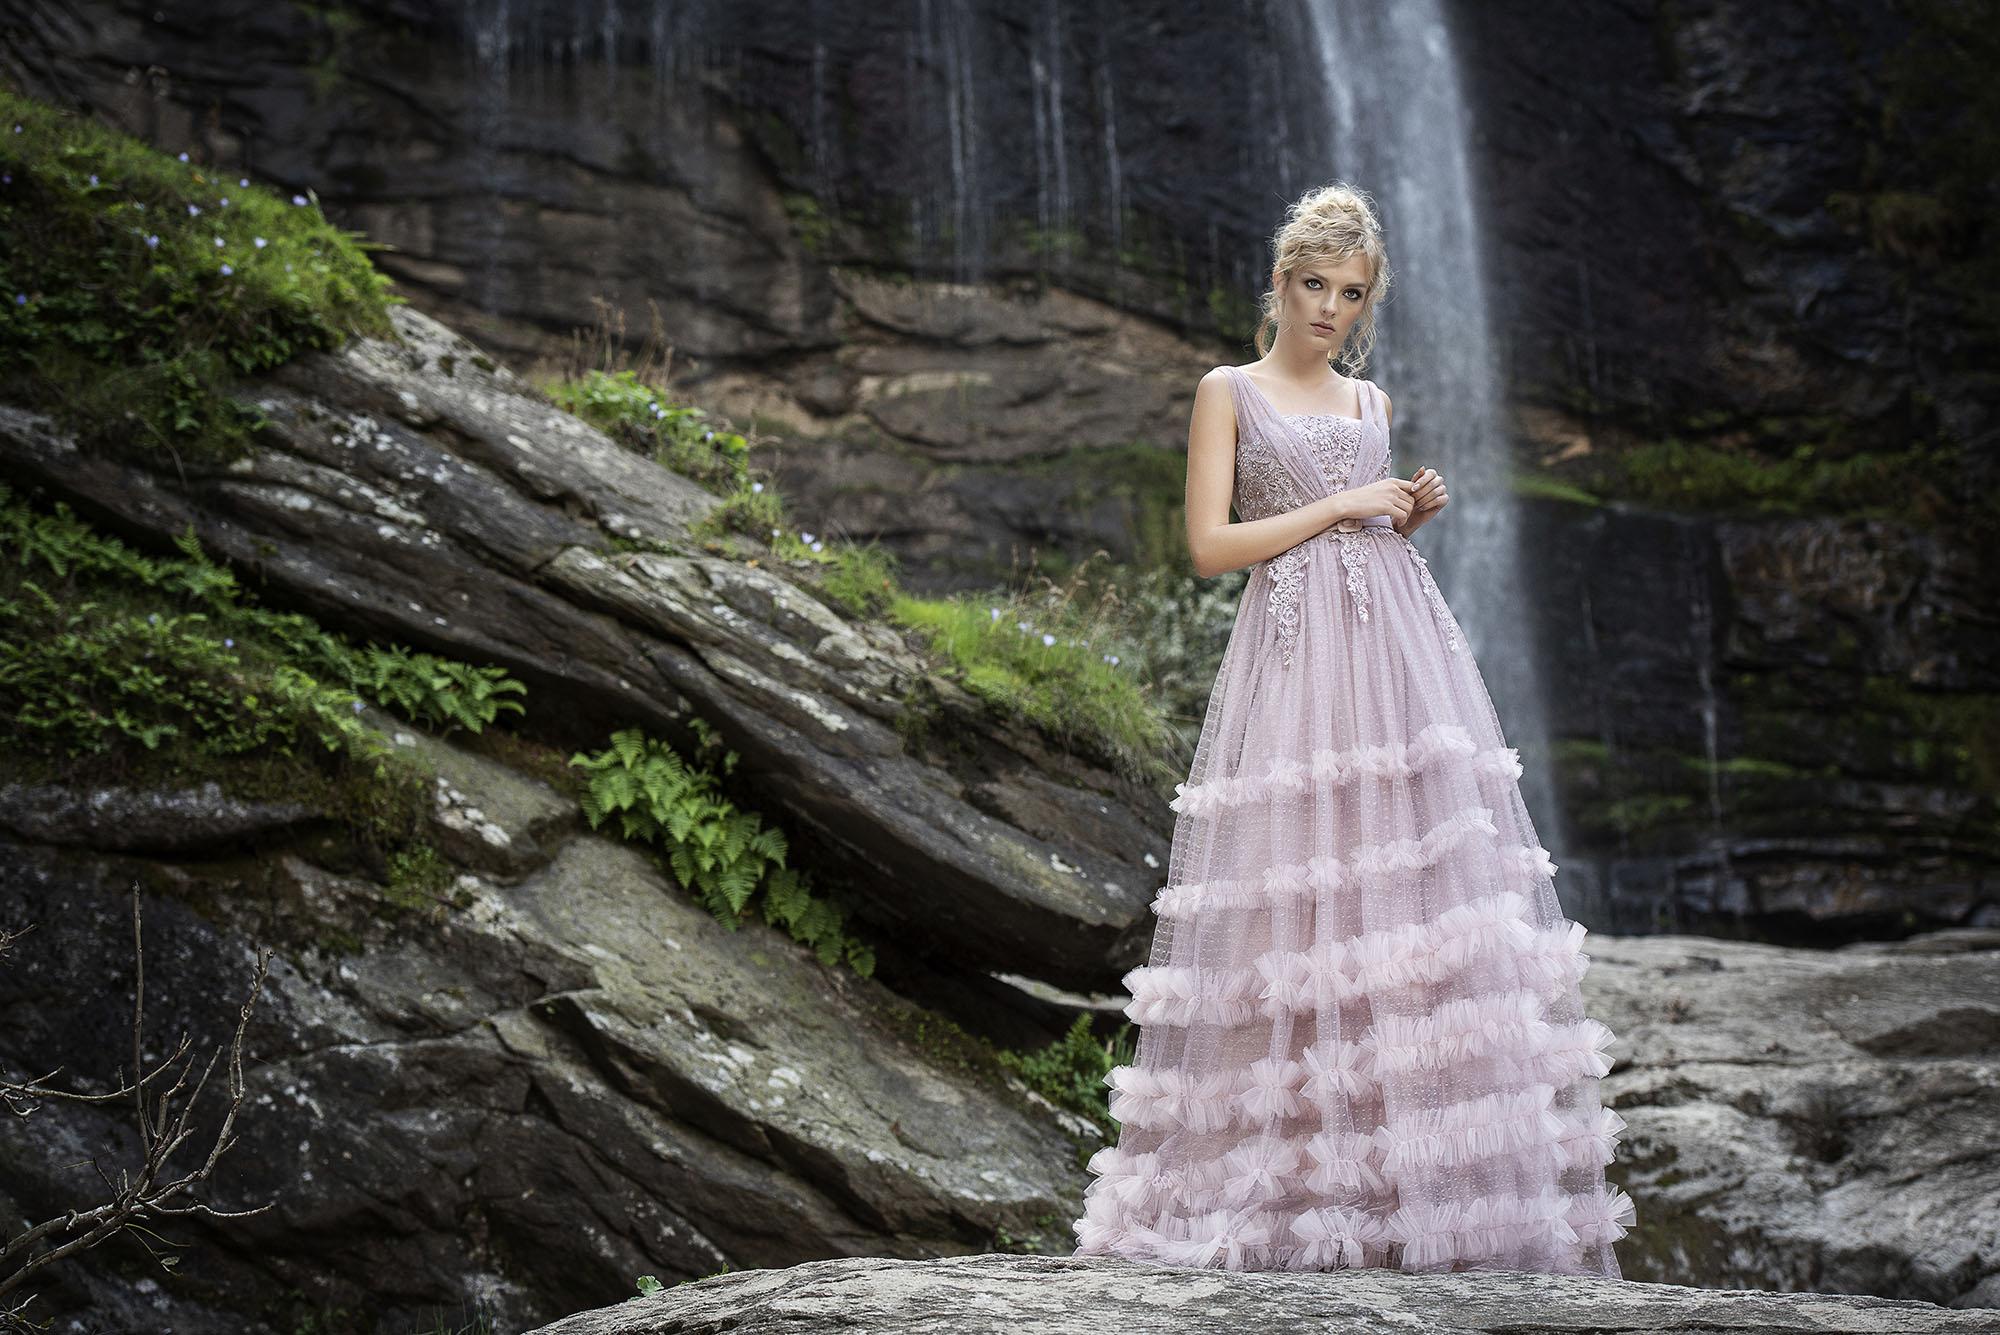 Moda_Fotograflari_Fashion_Ugur_Bektas_00008.jpg